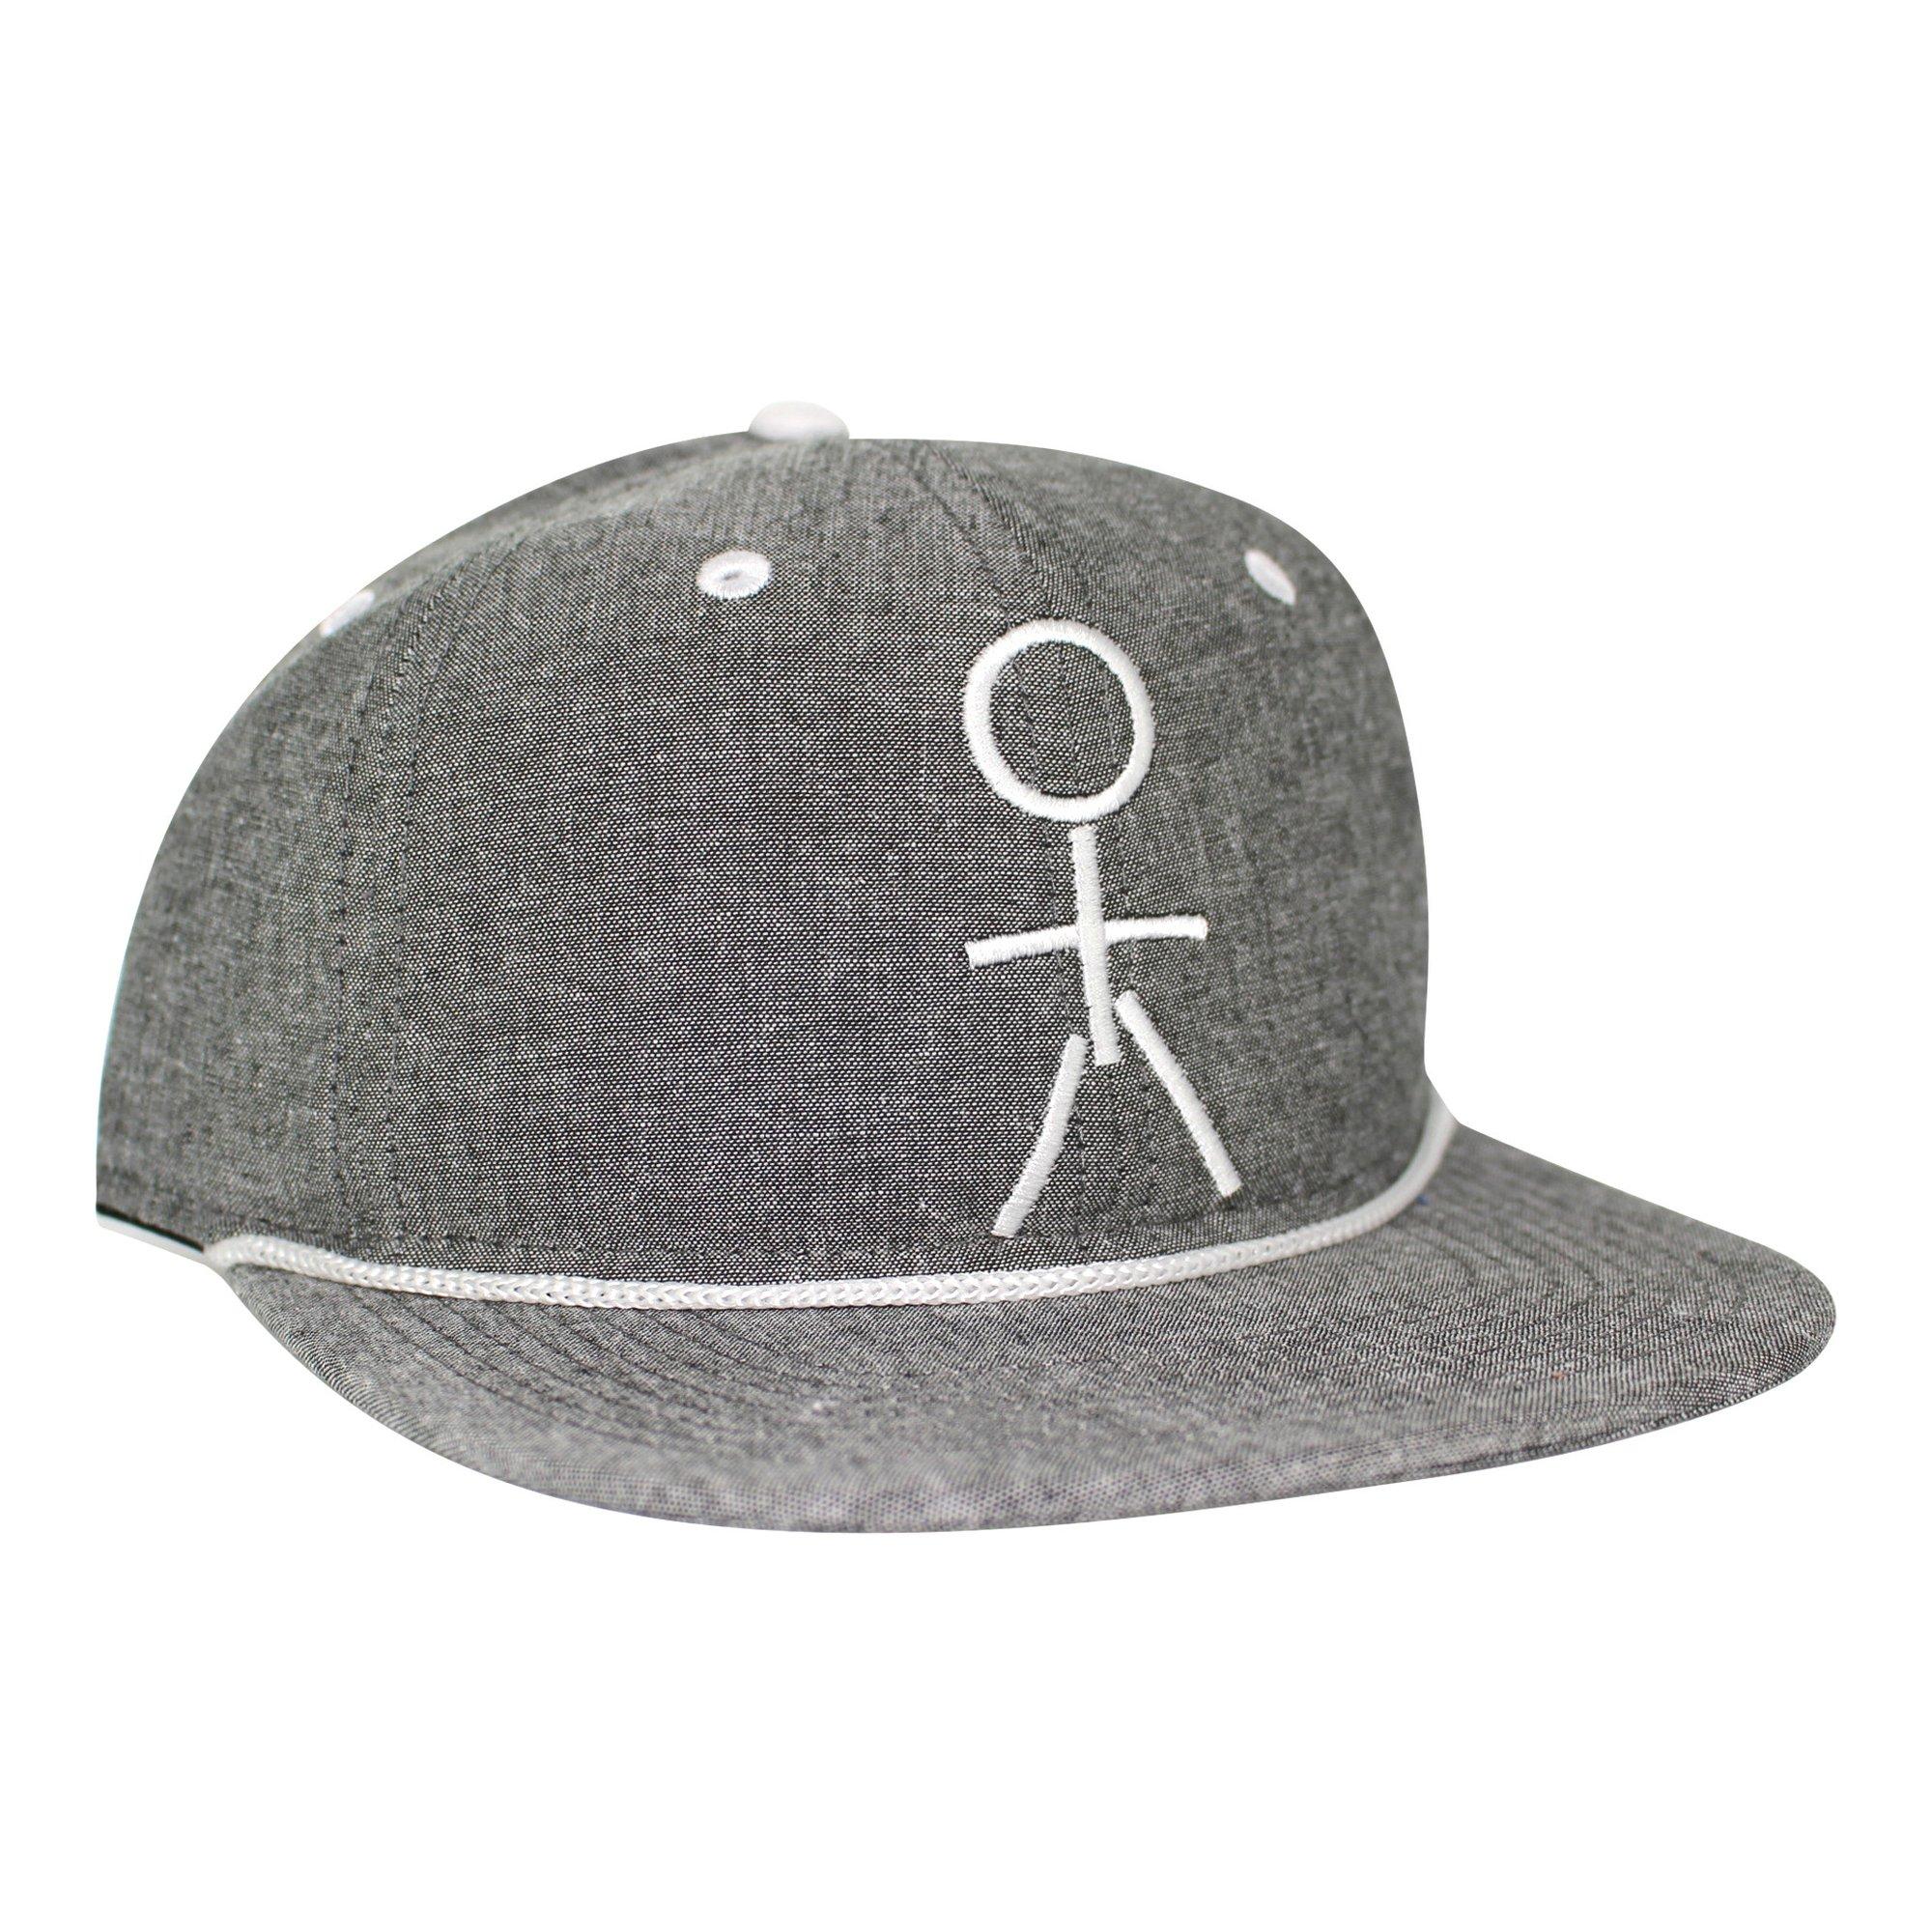 Stickman Snapback Gray Hat - Heather / White - Dicks Cottons Sunglasses